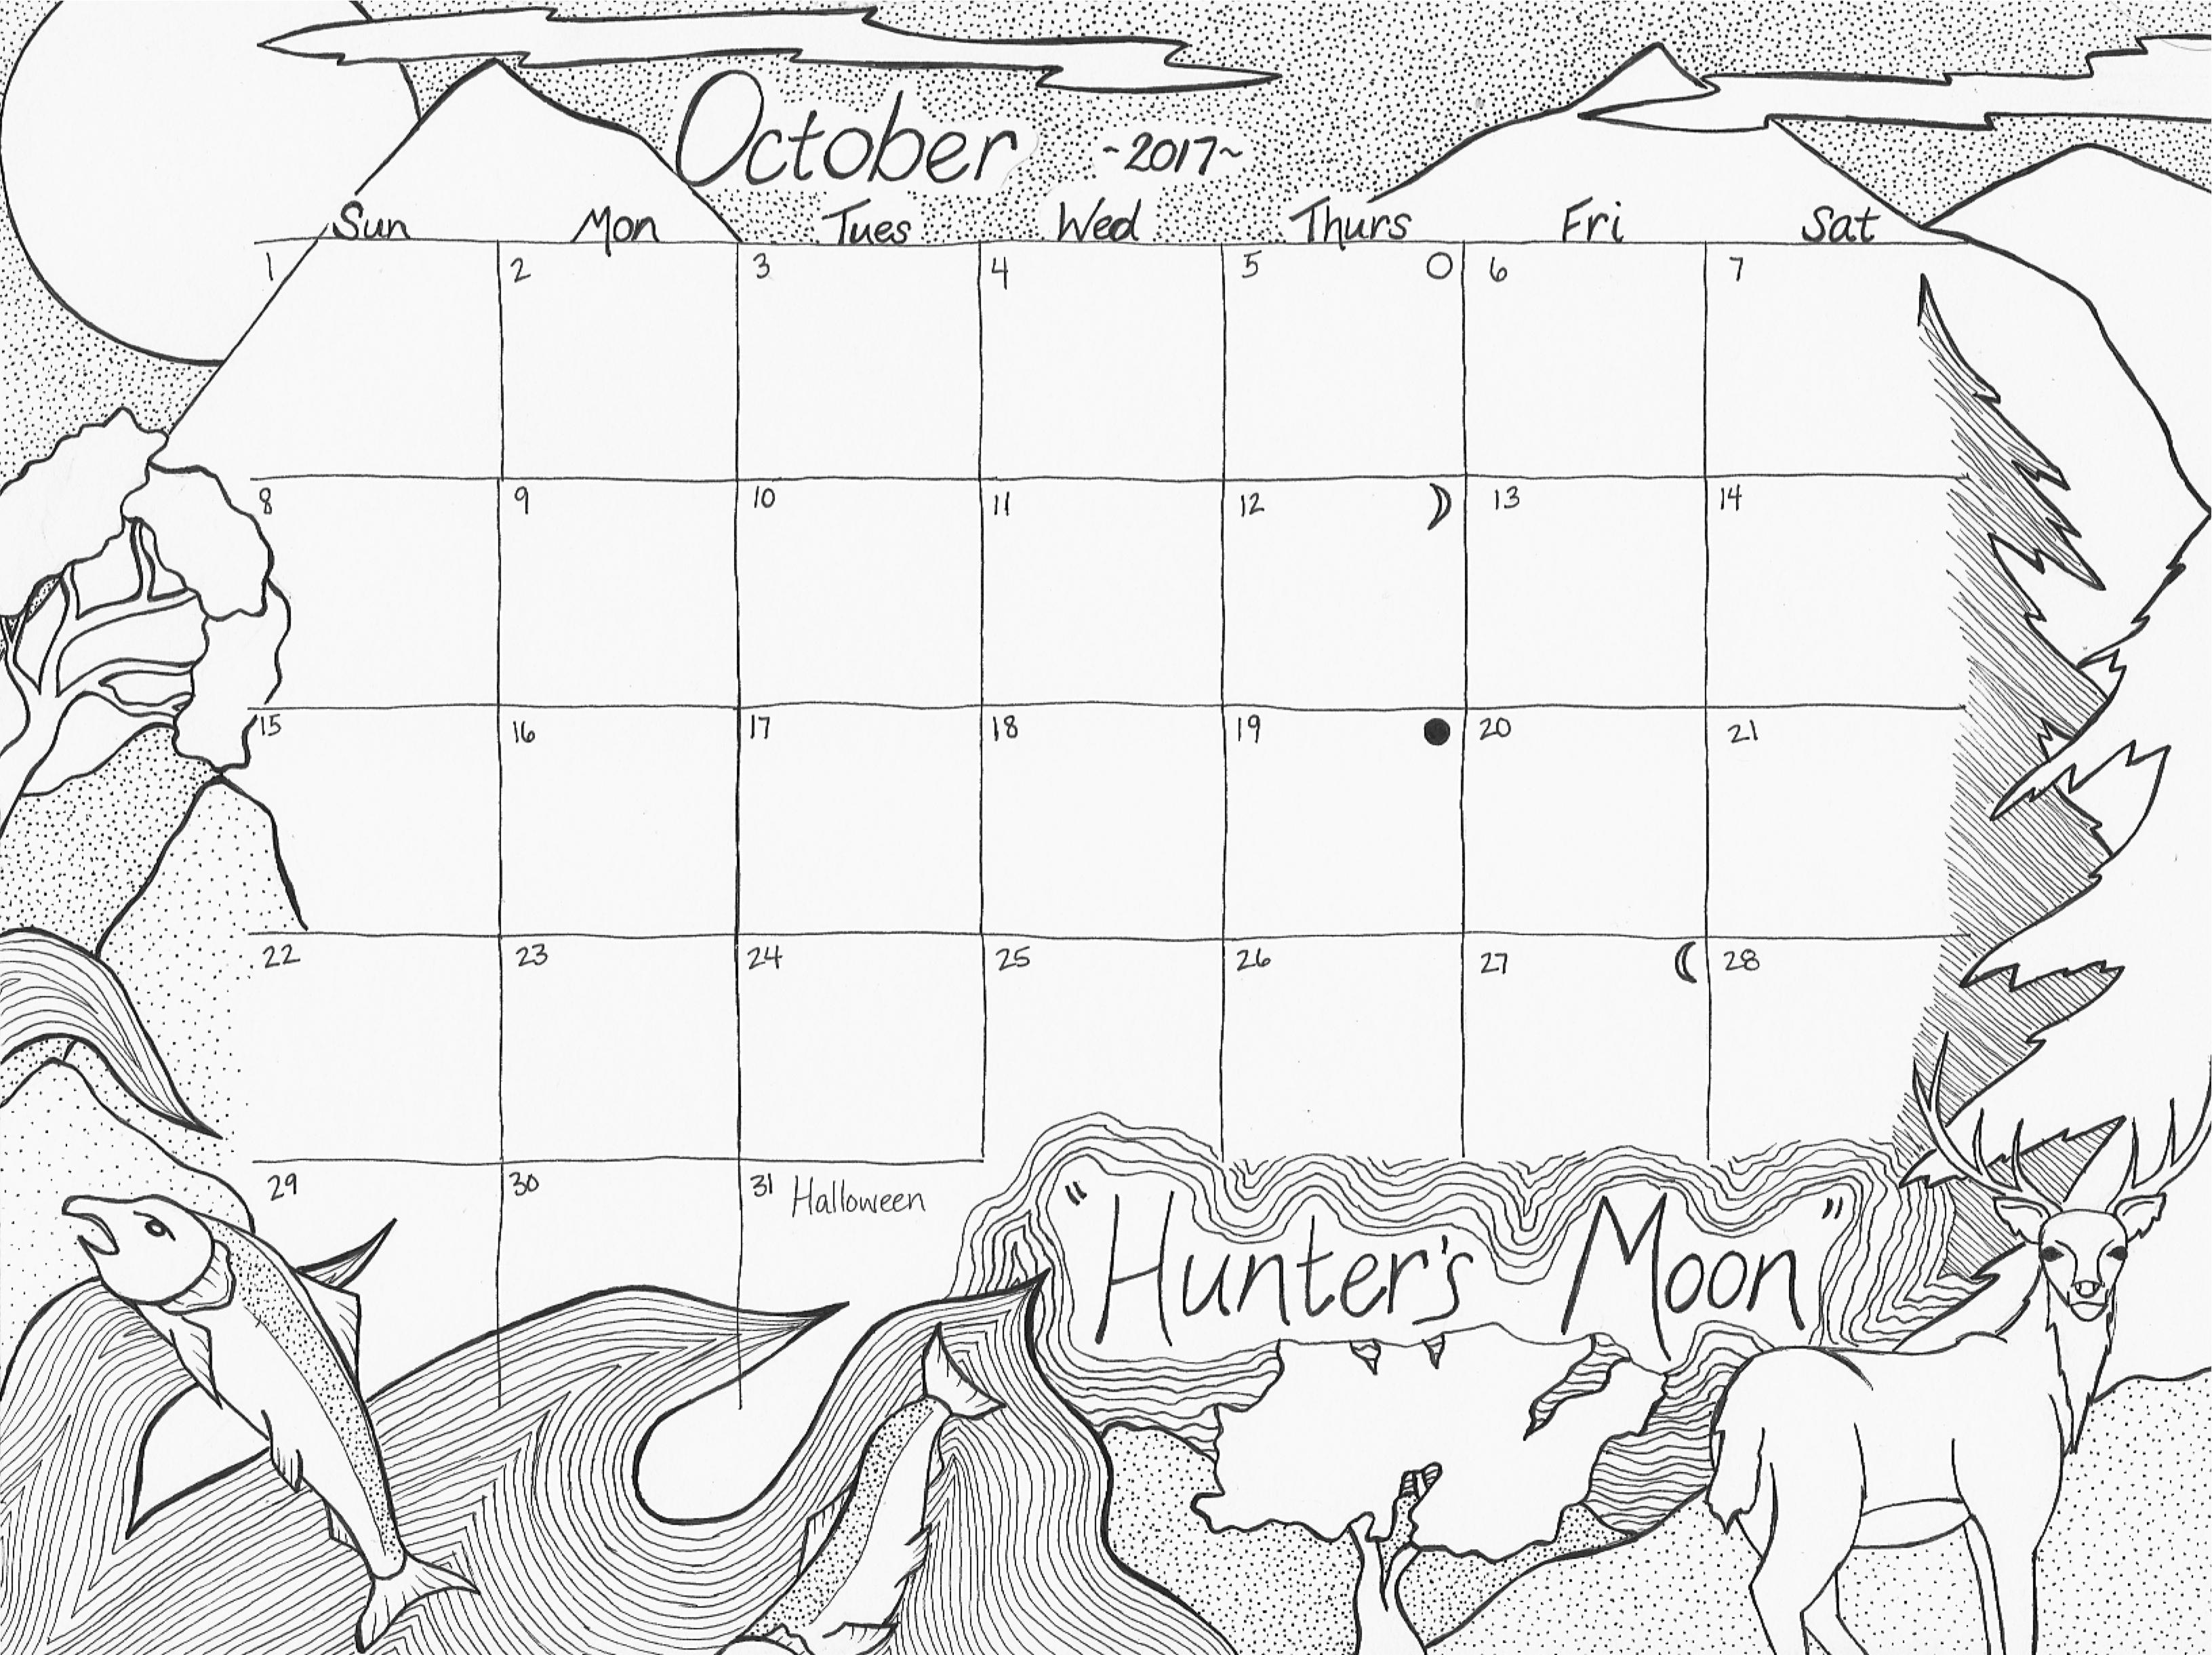 Calendar Drawing at GetDrawings.com | Free for personal use Calendar ...